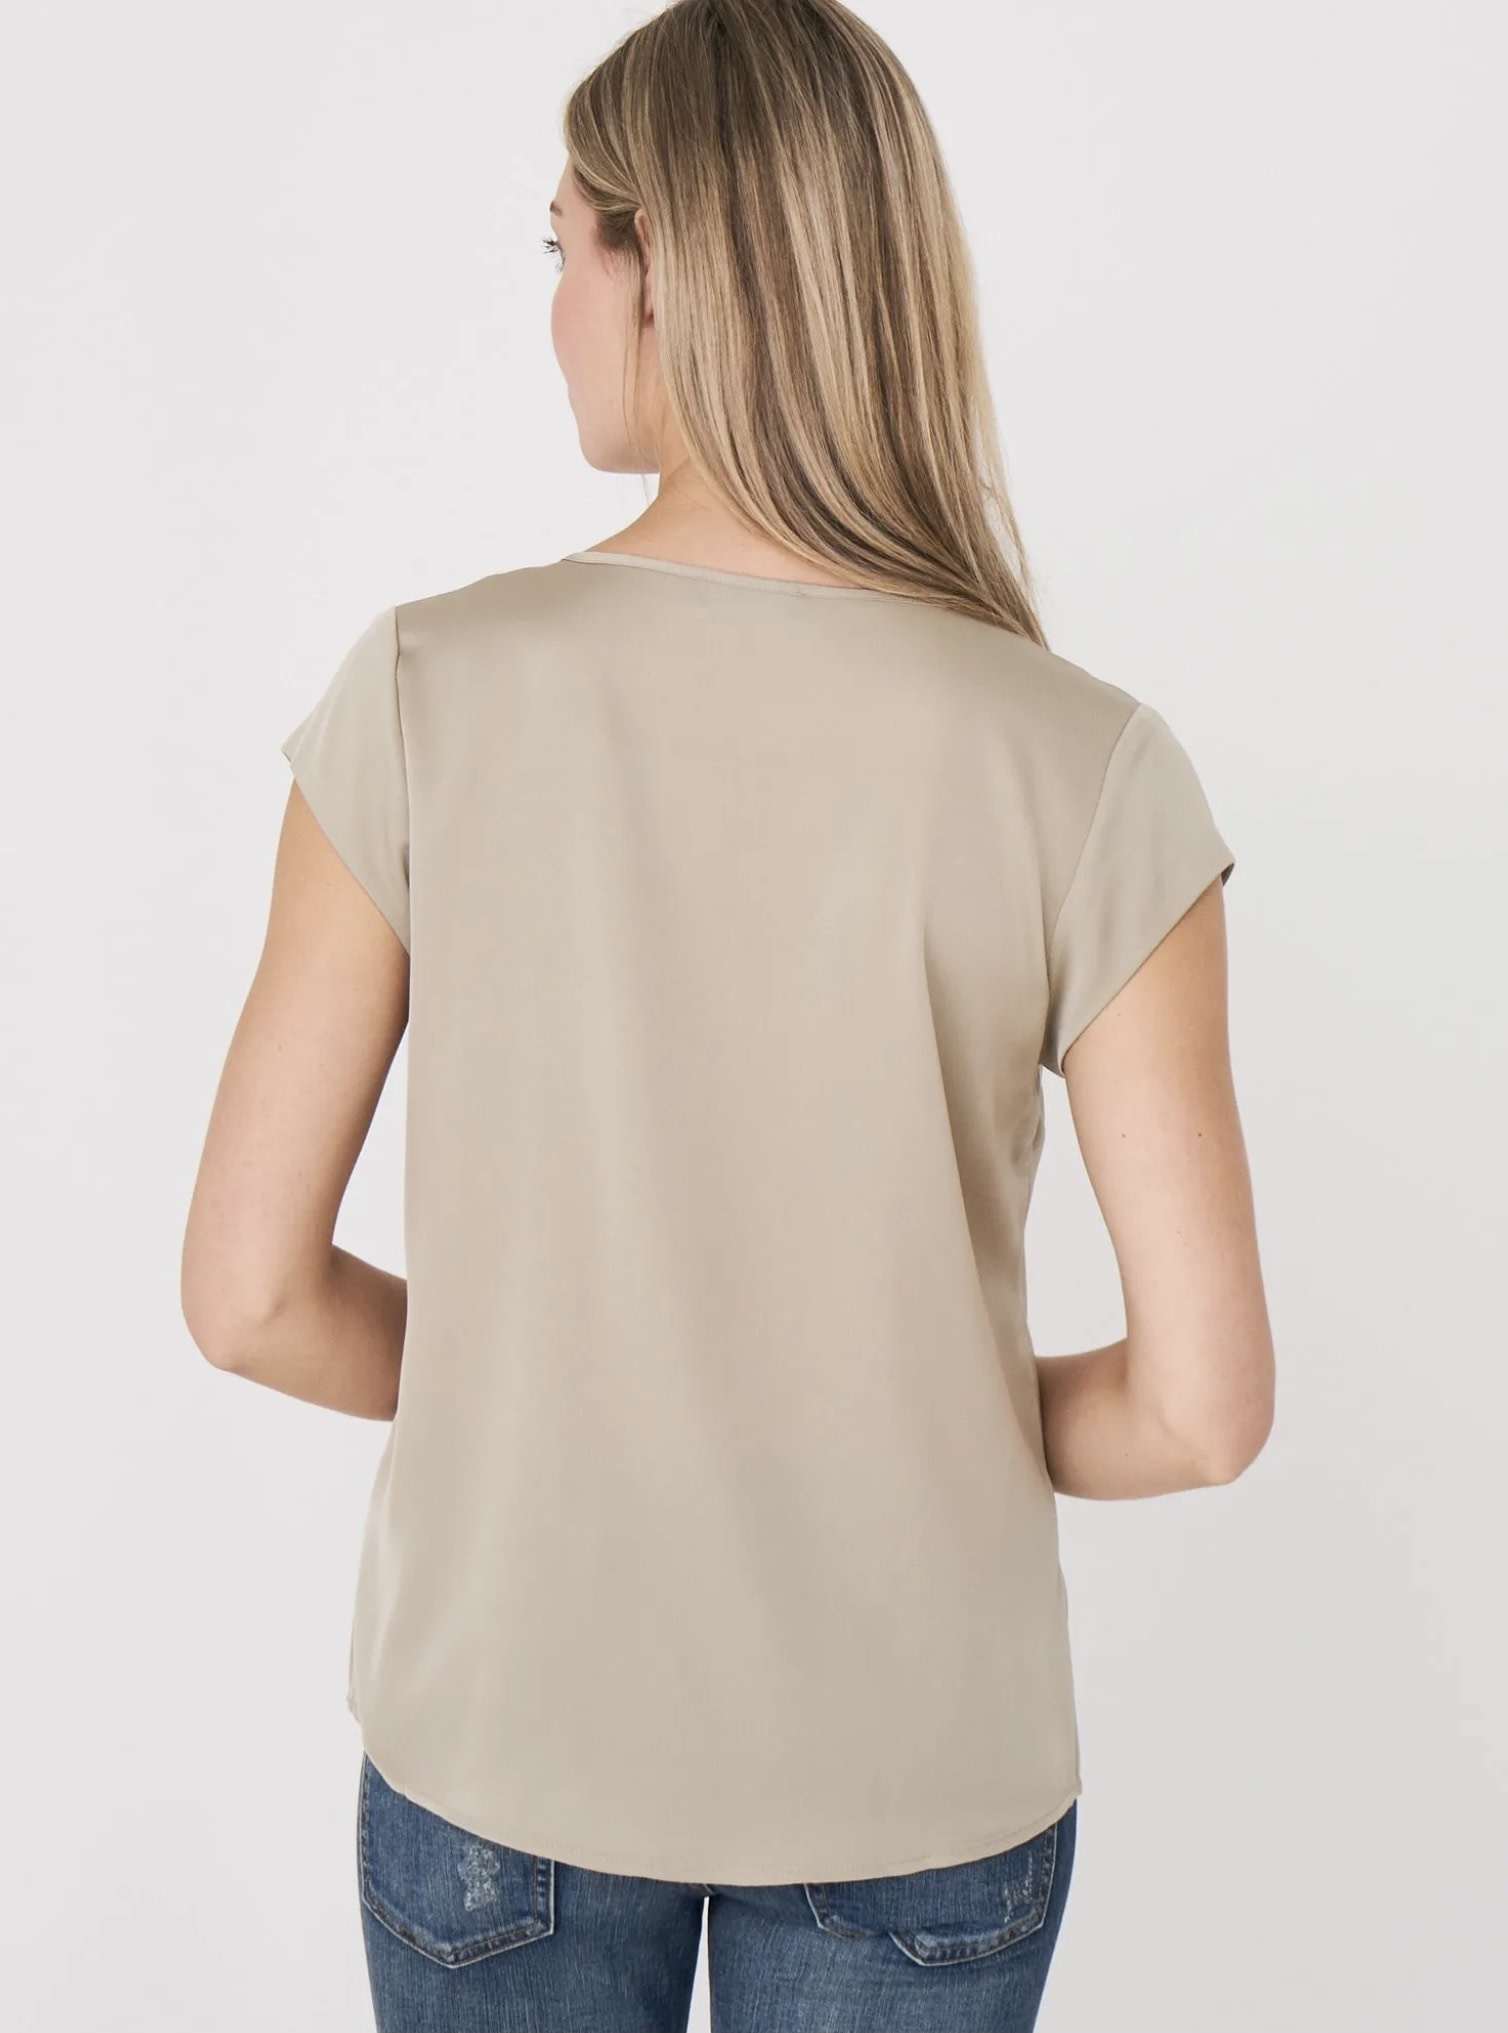 blouse repeat 600003-2